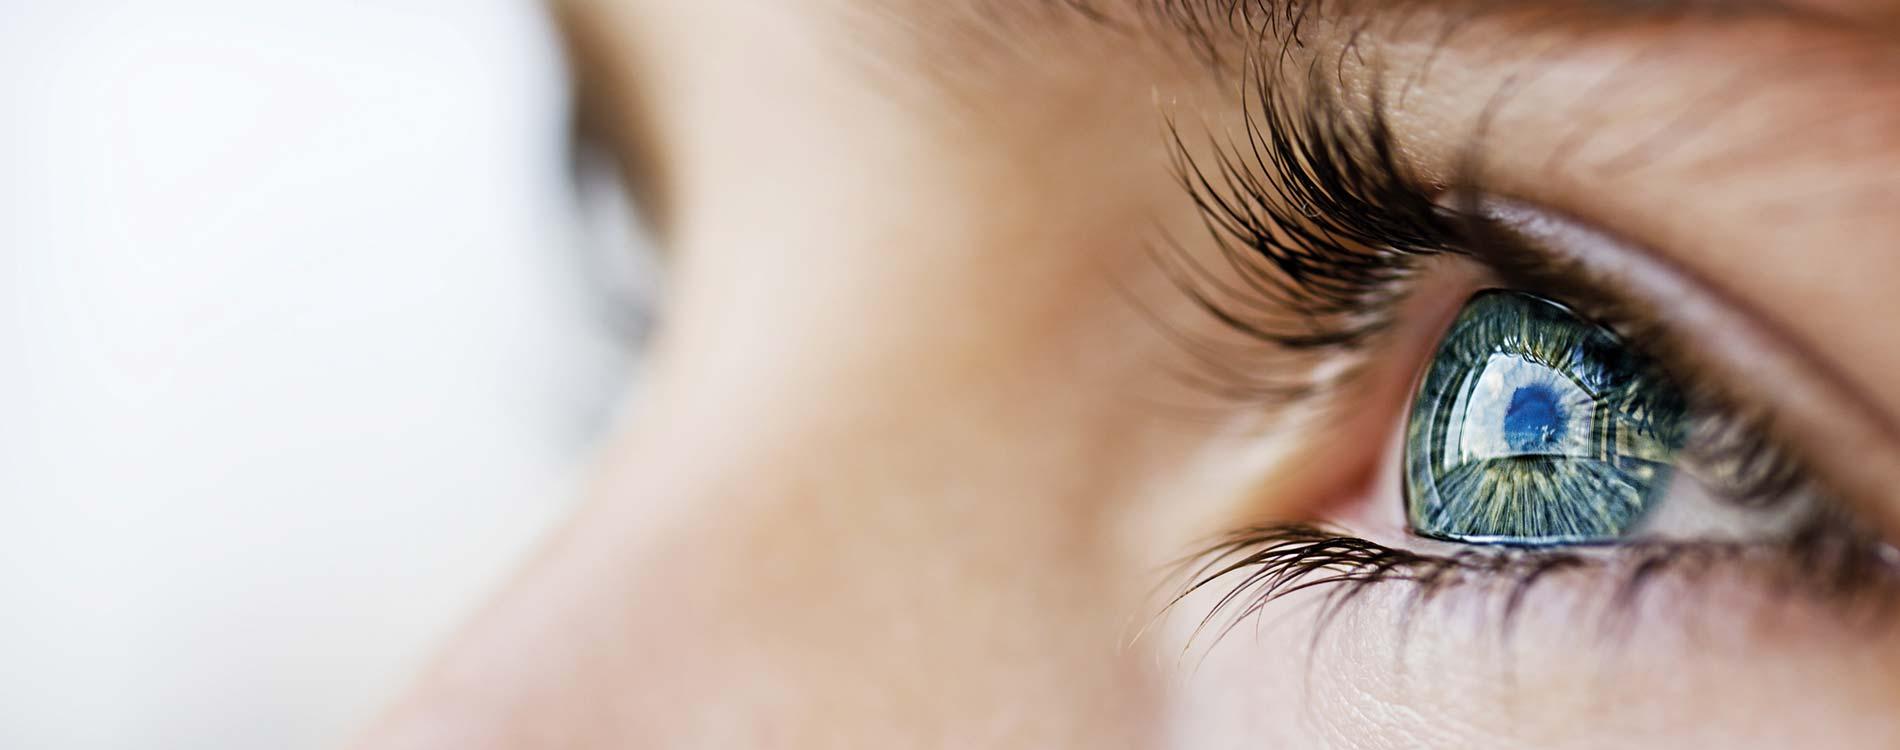 Wimpernverlängerung Wimpernextensions PROSPA Kosmetik Imst Kosmetikstudio Oberland